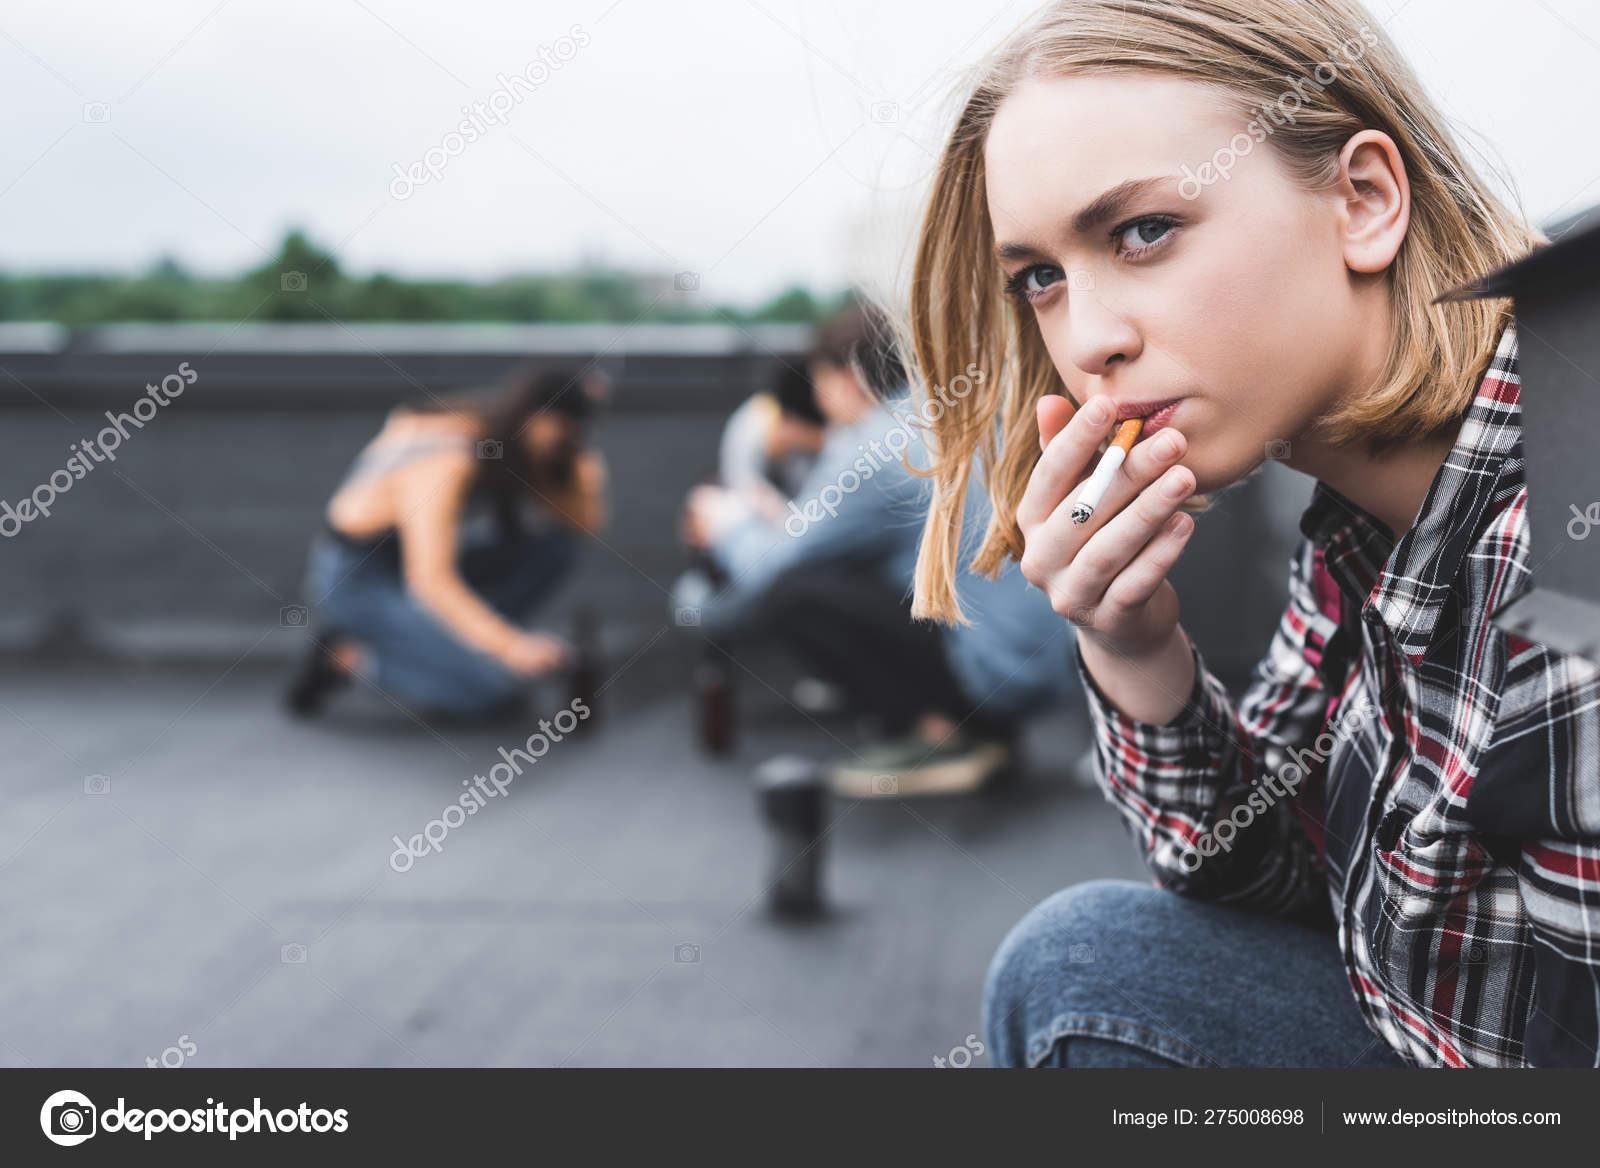 Smoking young videos girls Watch: A